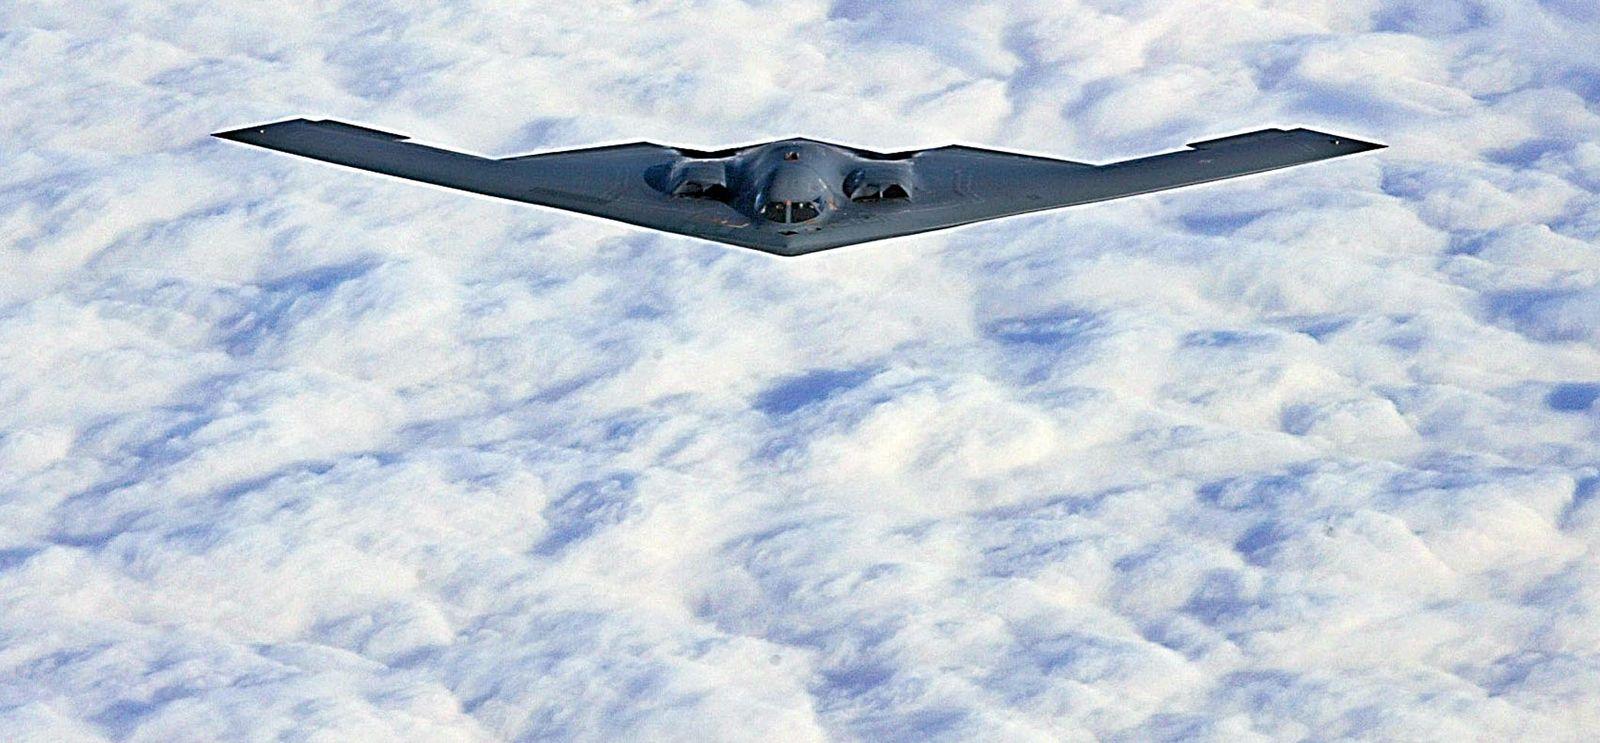 Libyen/ US-Bomber Stealth B2/ Archivbild